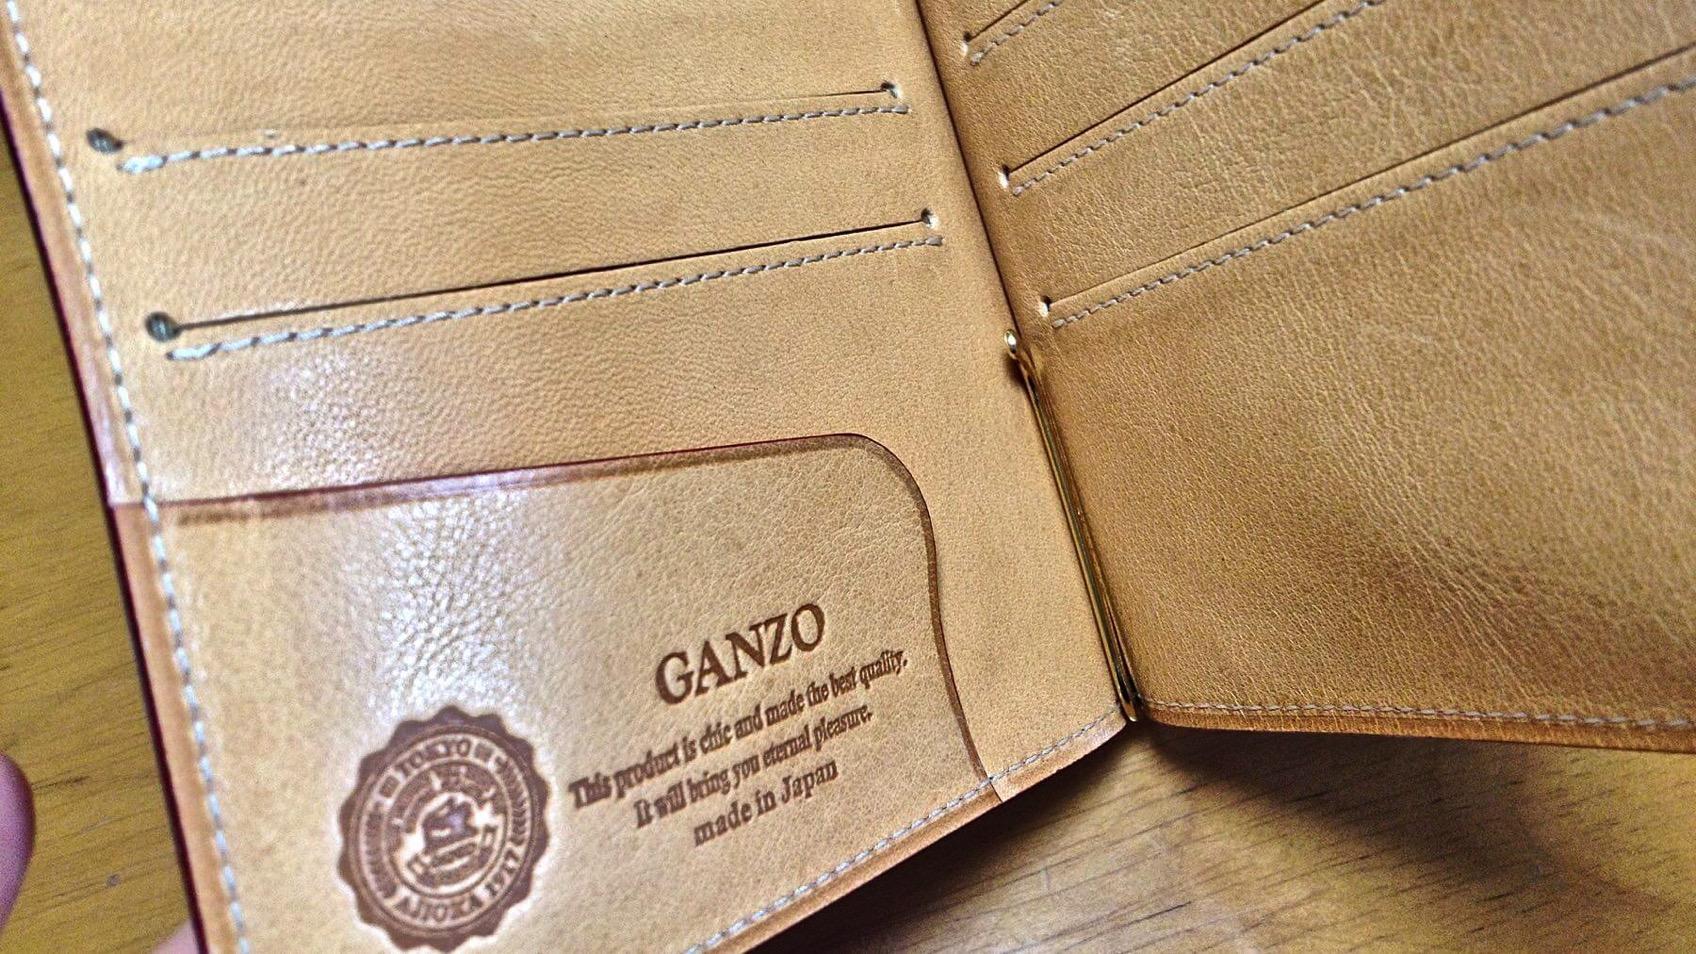 04 Ganzo Thin Bridle Money clip Inside